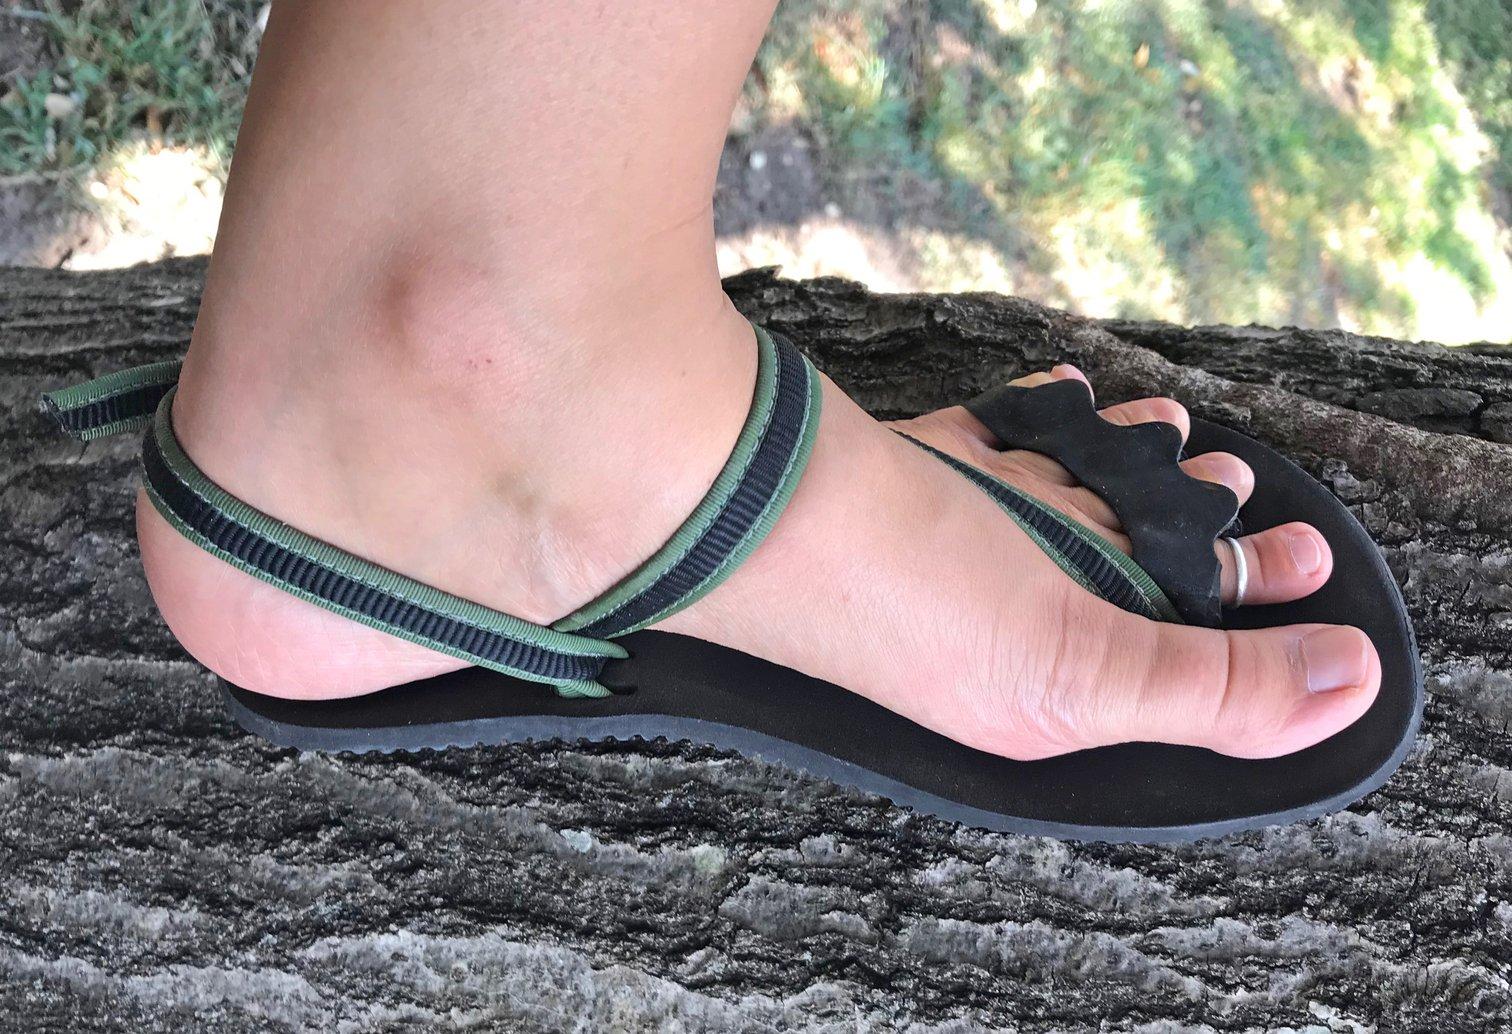 Foot Restoration Kit Picture 6